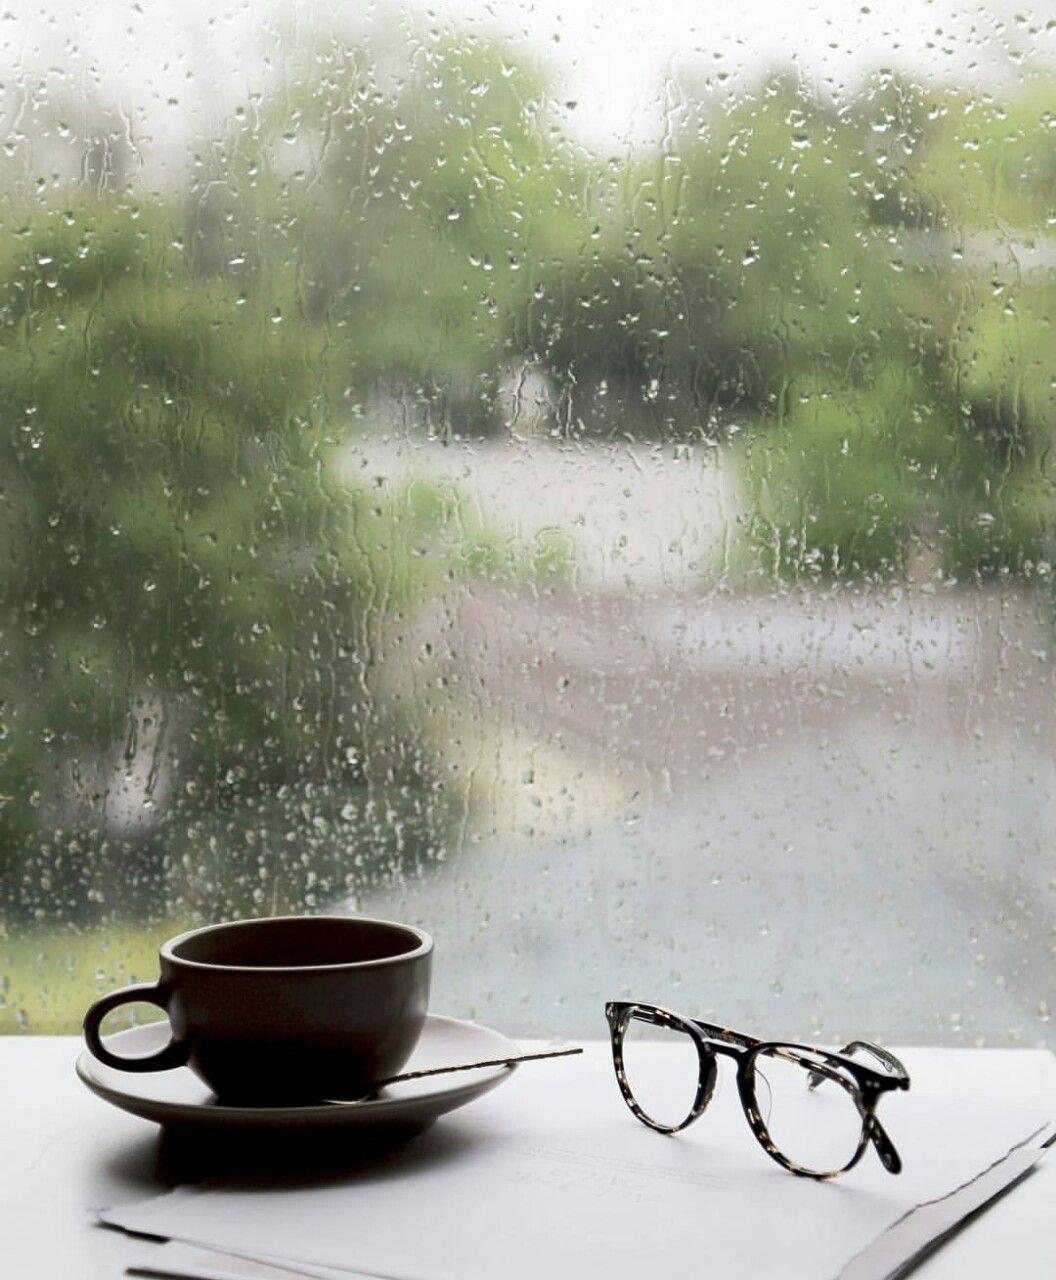 Morning Coffee Ironstone & Indigo Rain and coffee, Rainy